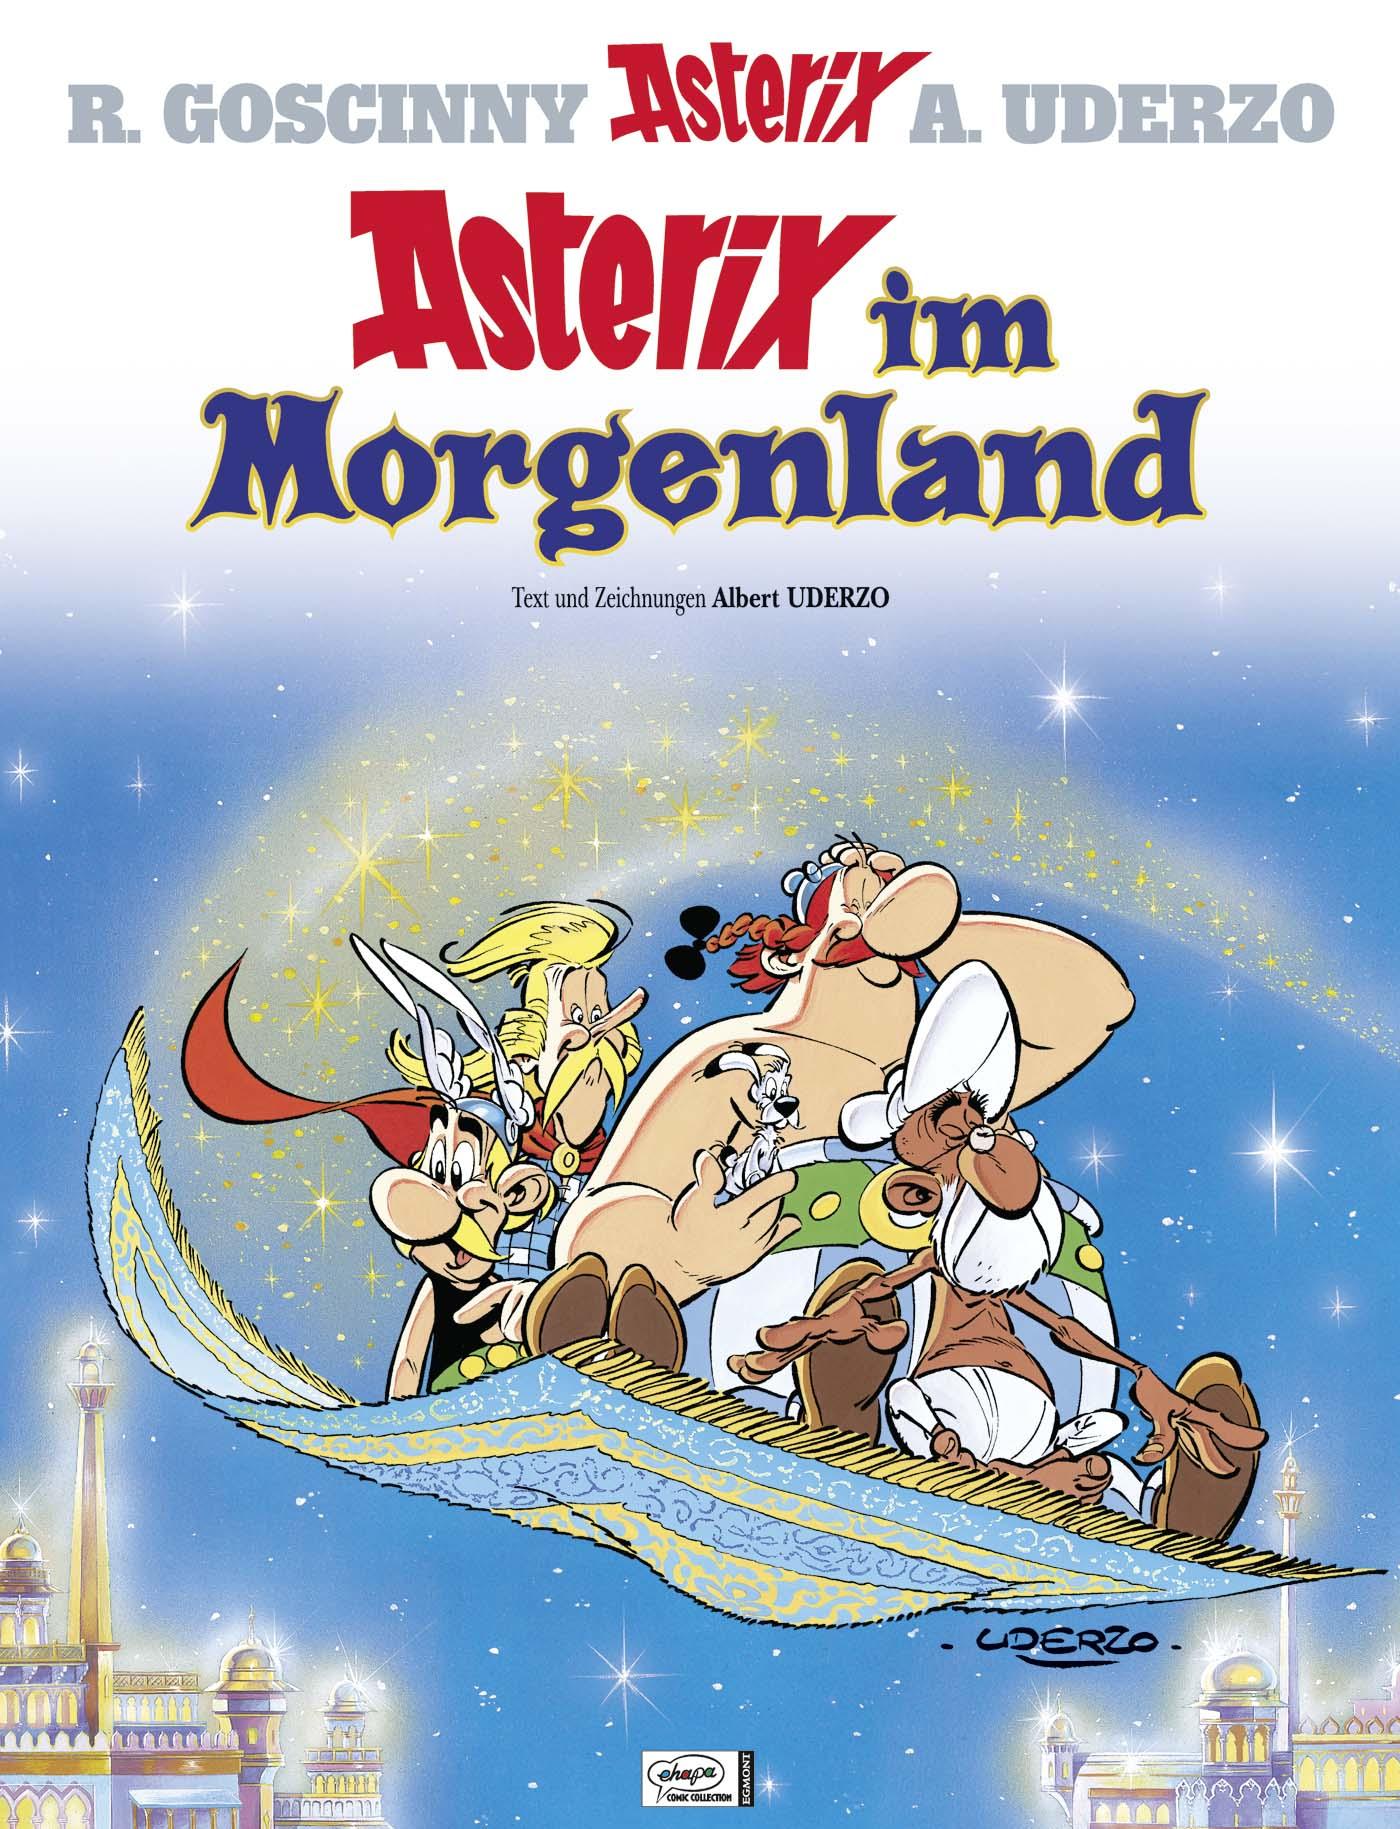 Asterix: Band 28 - Asterix im Morgenland - R. Goscinny & A. Uderzo [Gebundene Ausgabe]